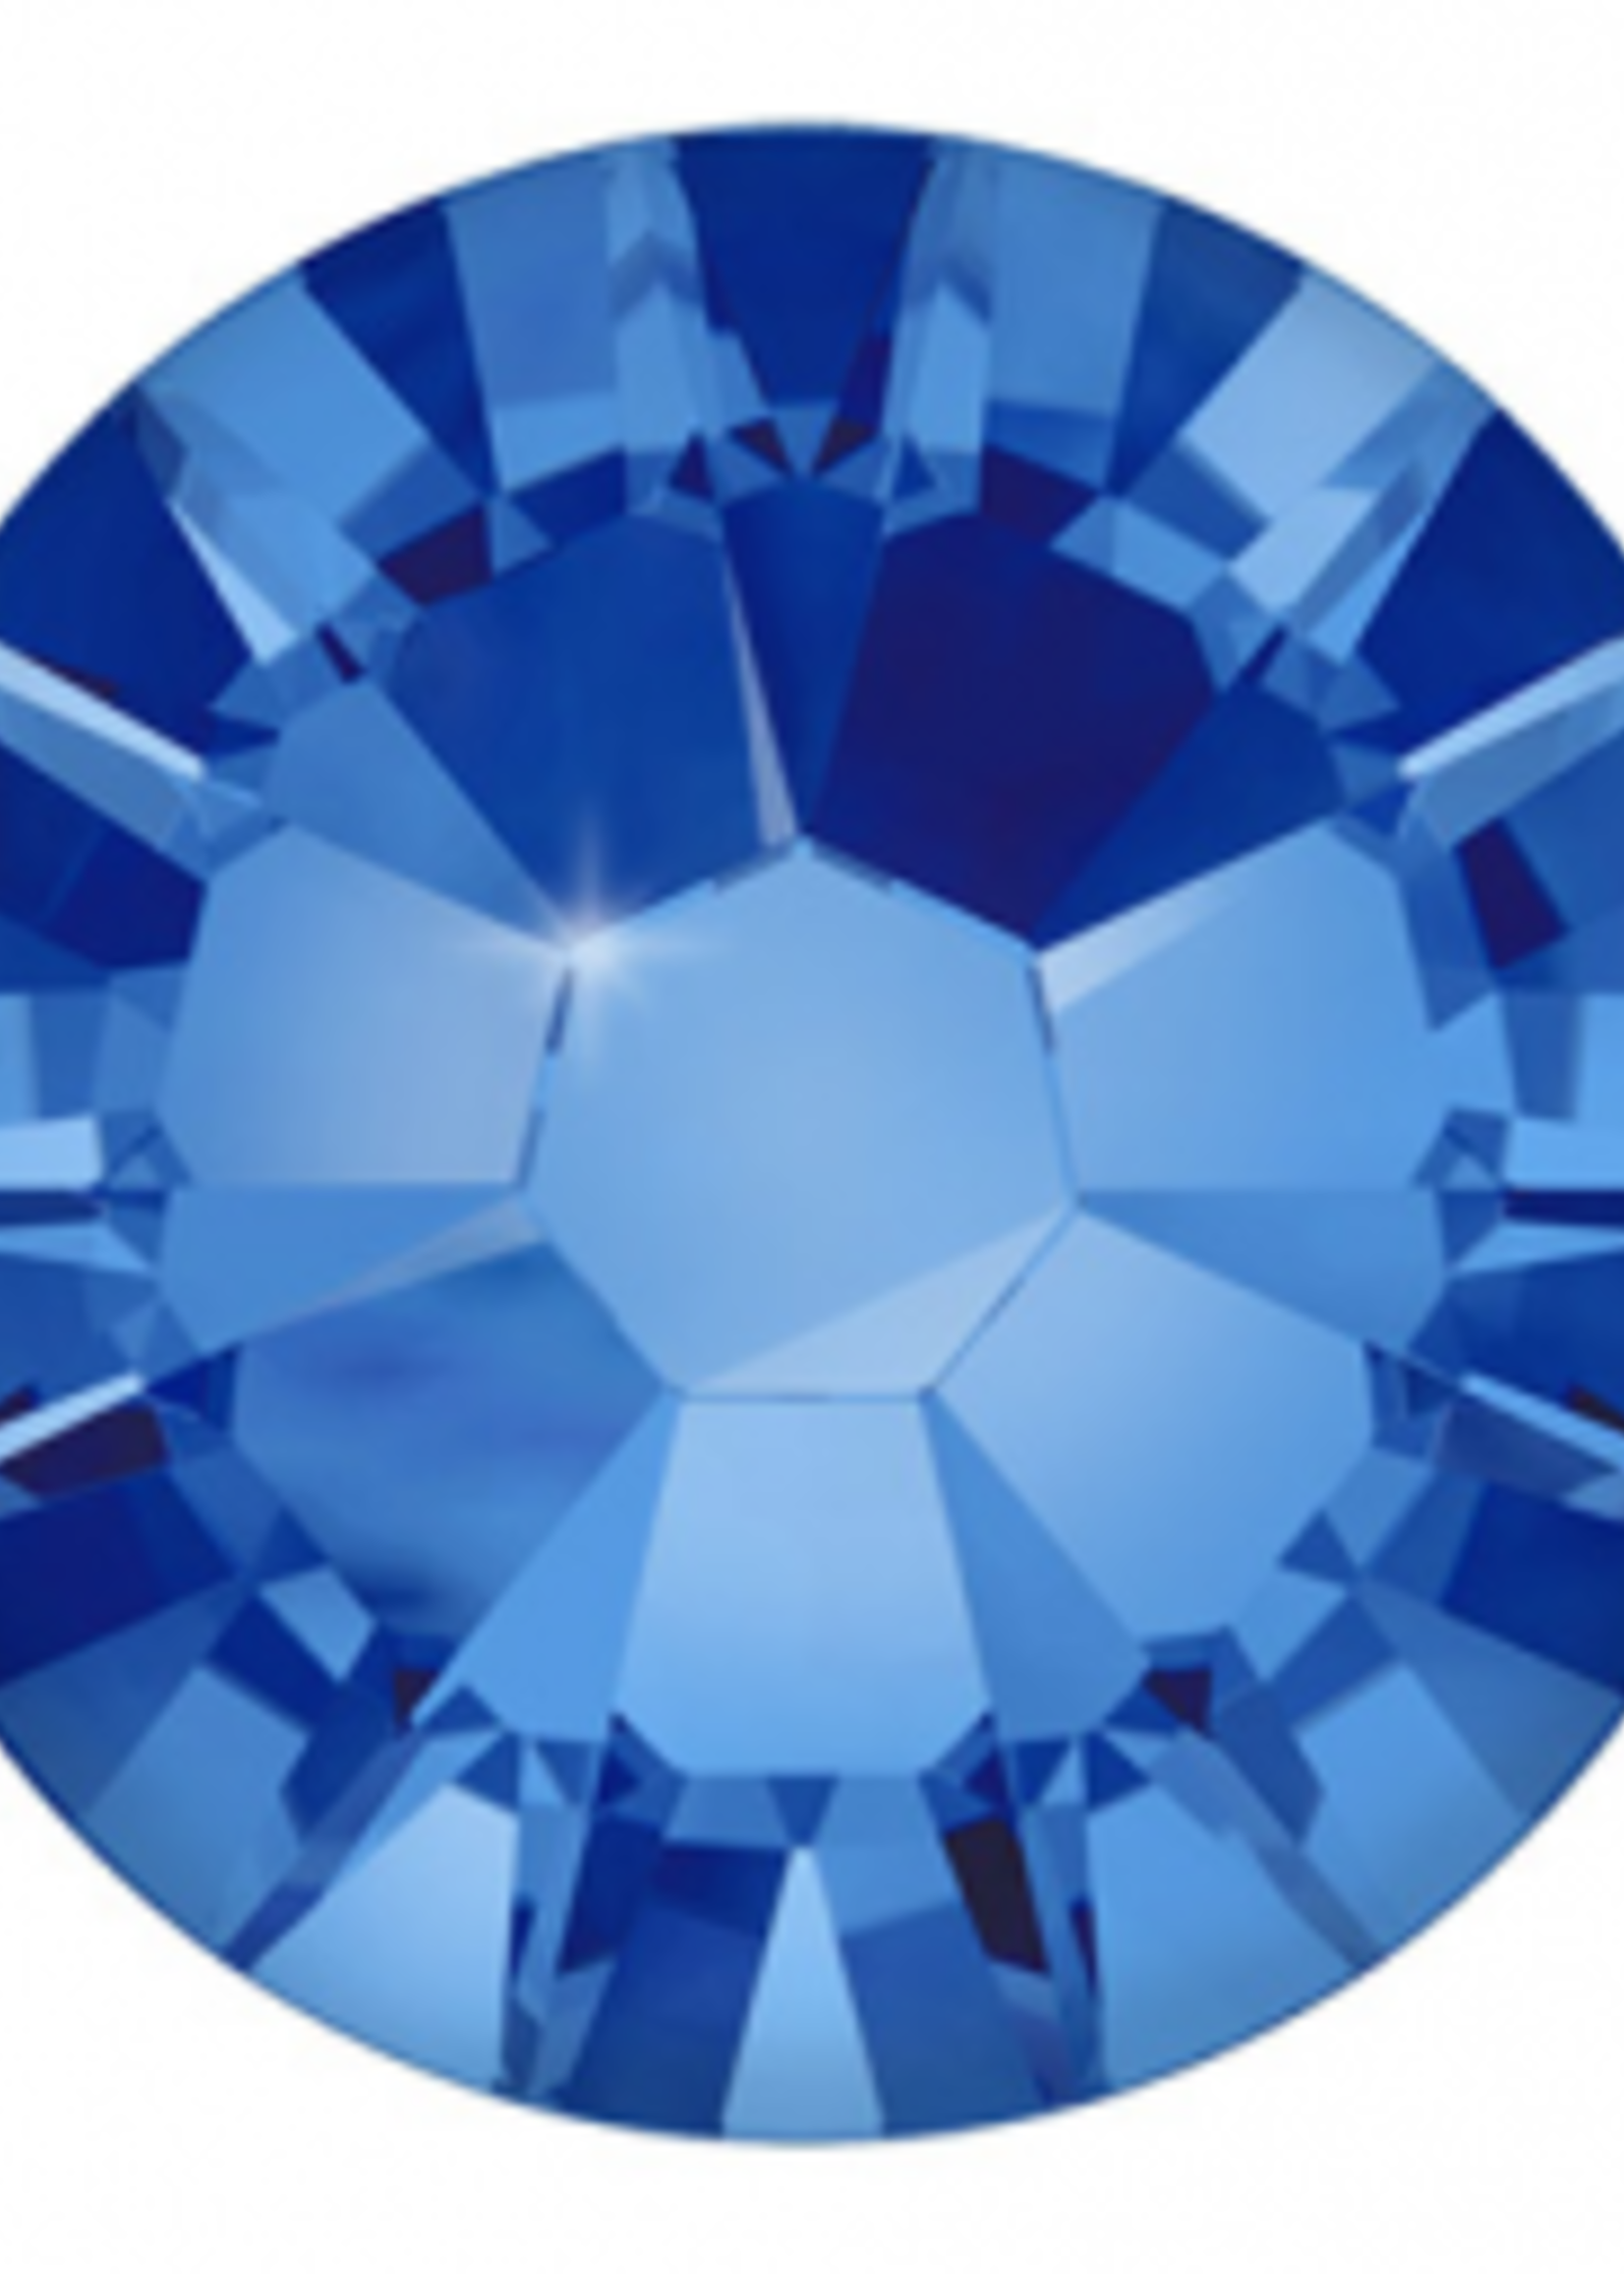 Swarovski Swarovski Crystal Sapphire Blue 2.15 mm